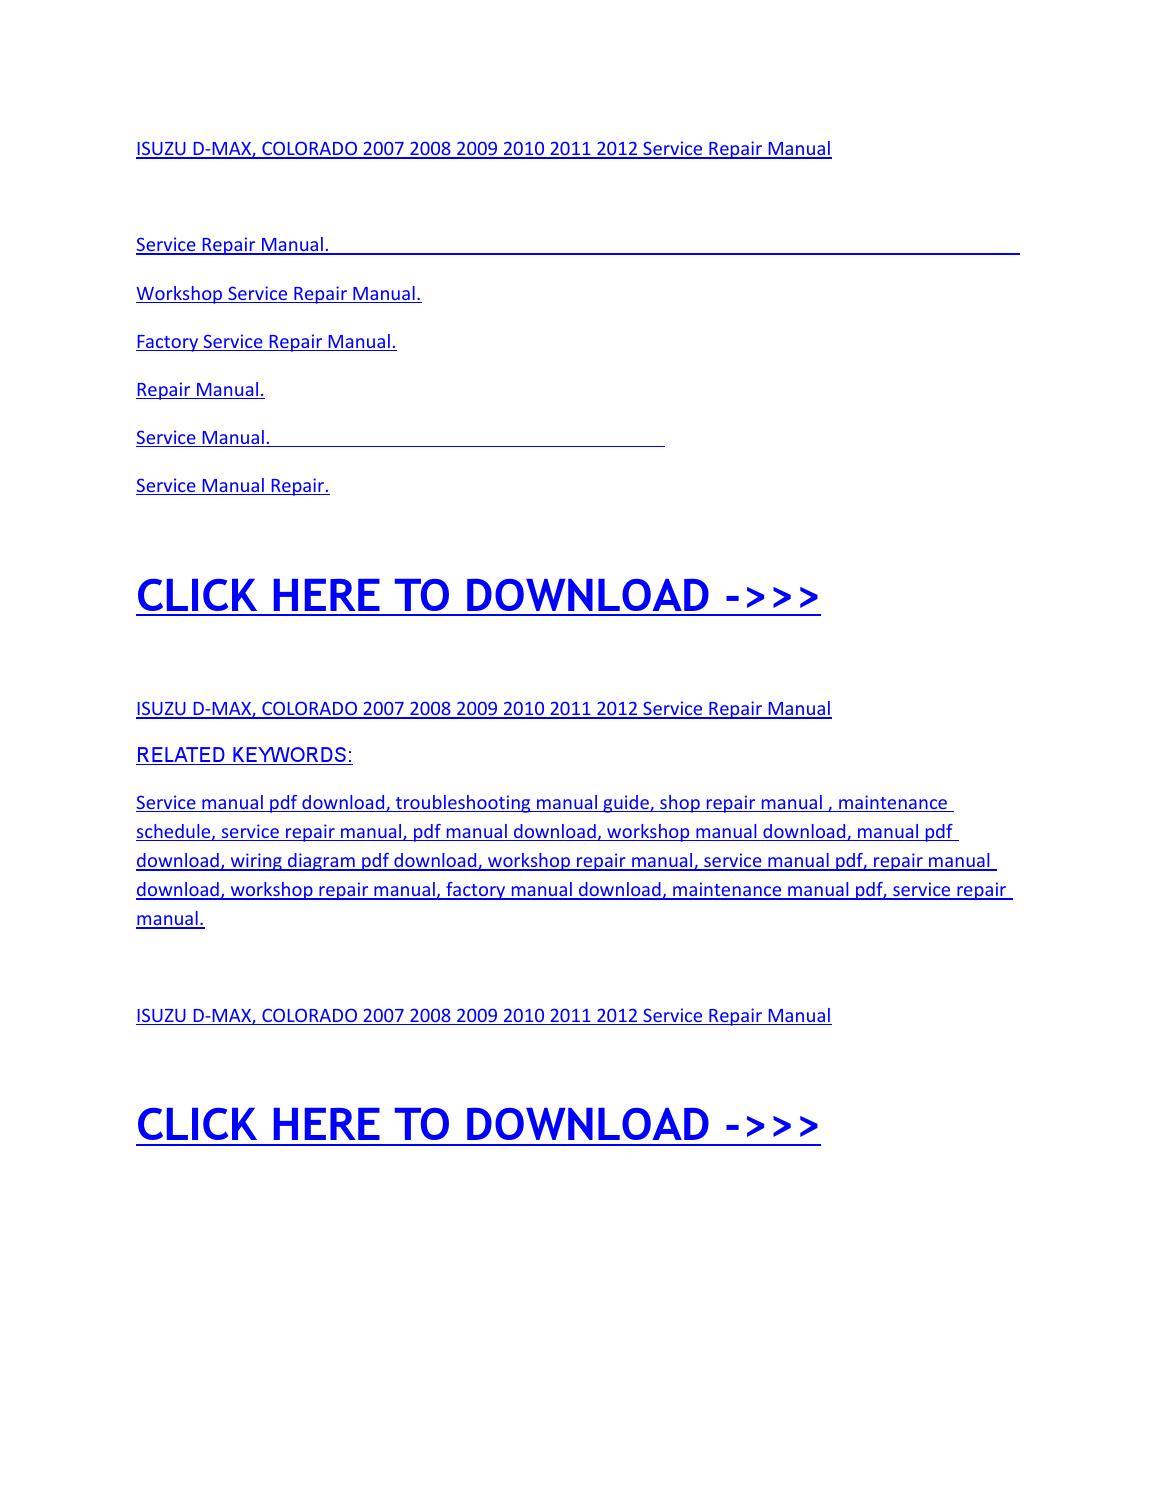 Isuzu d max, colorado 2007 2008 2009 2010 2011 2012 service repair manual  by miha - issuu